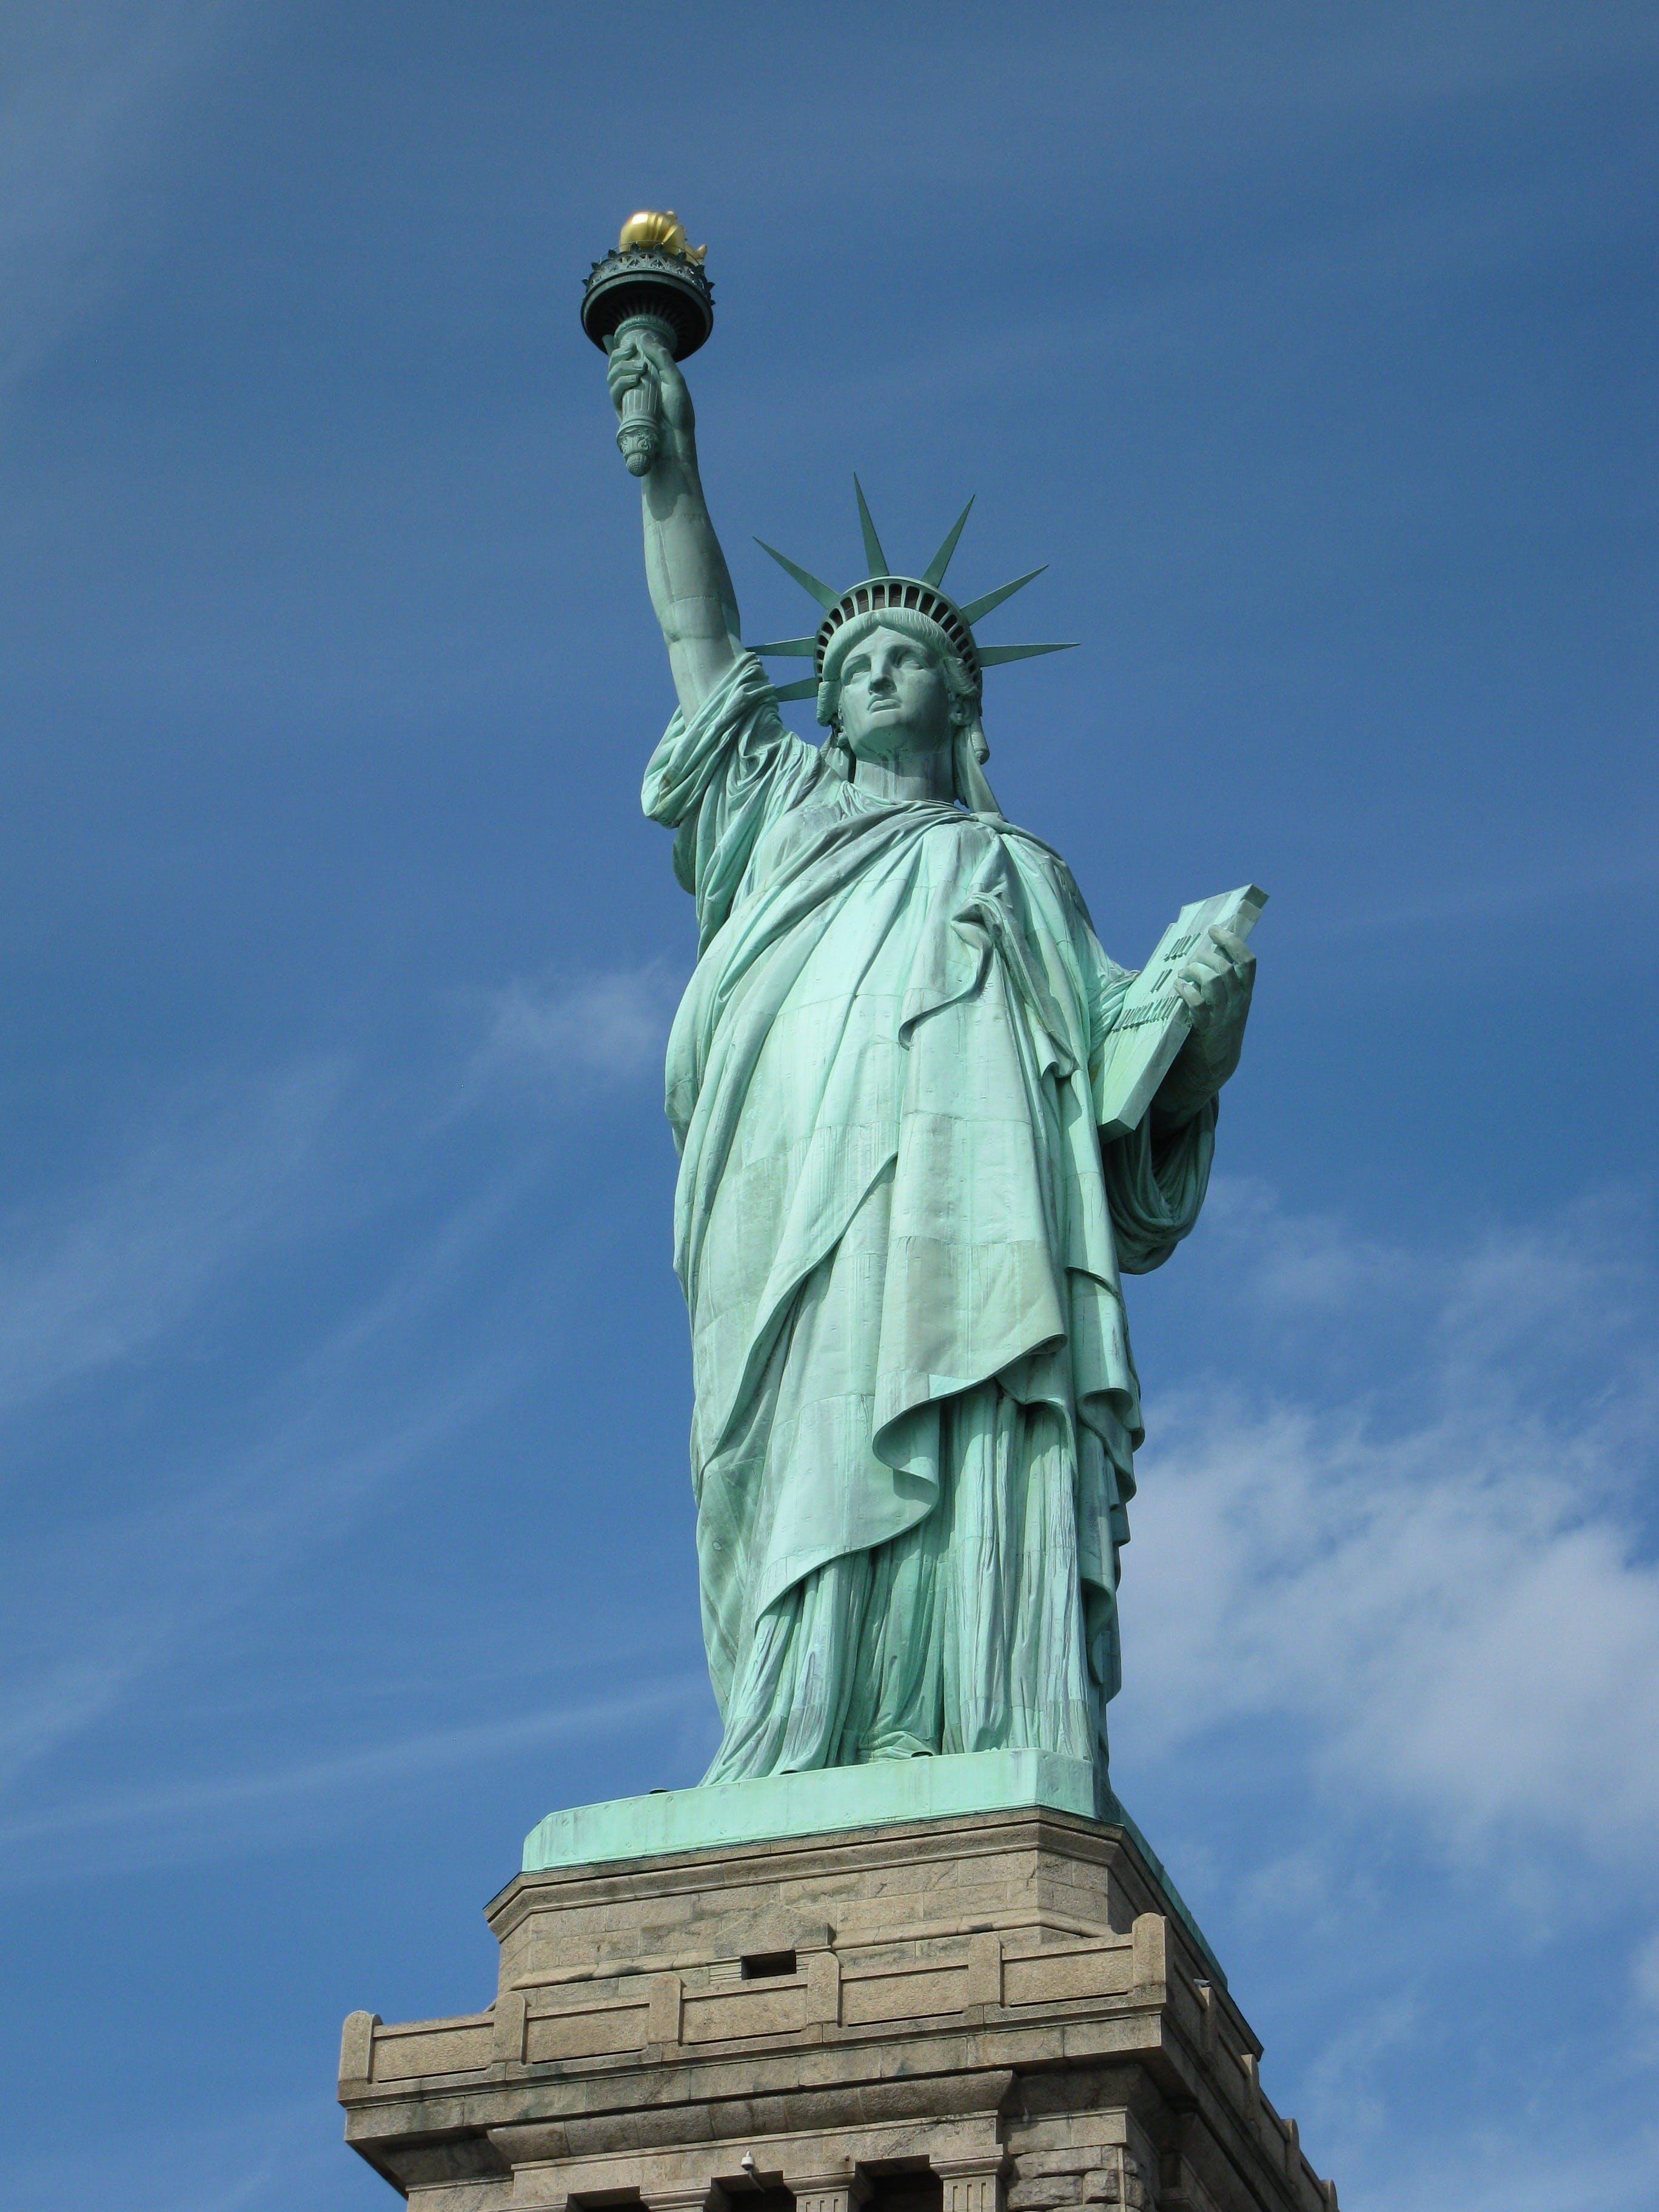 město new york, new york, nyc